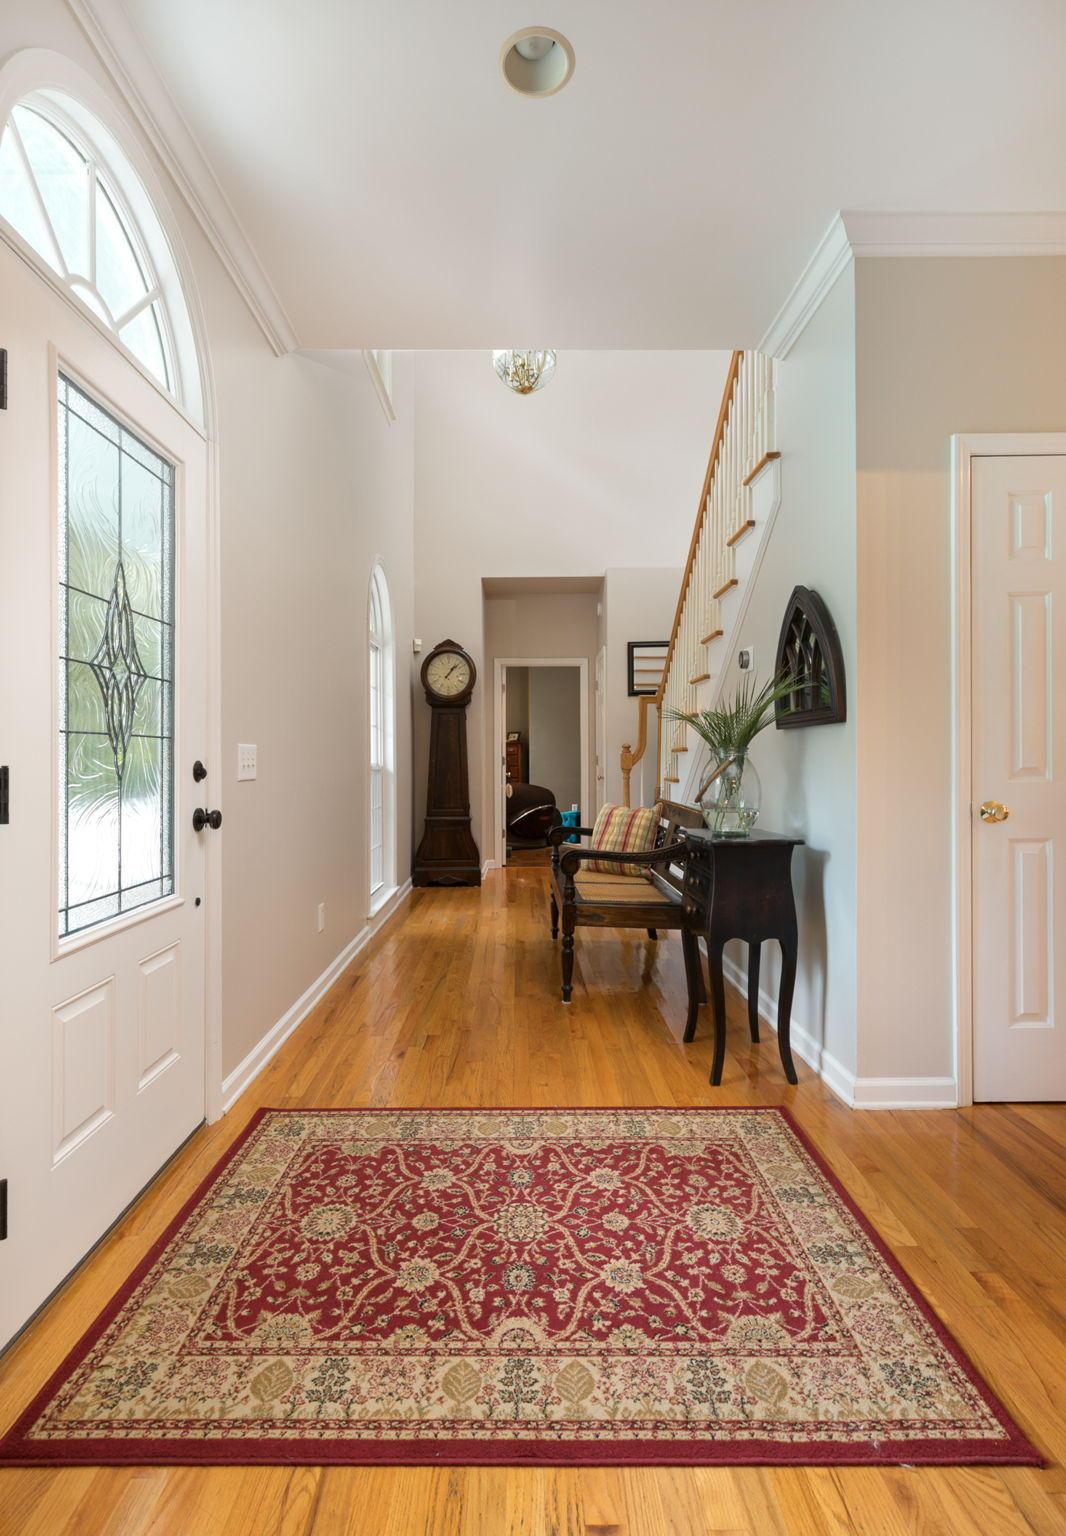 Dunes West Homes For Sale - 3625 Colonel Vanderhorst, Mount Pleasant, SC - 21